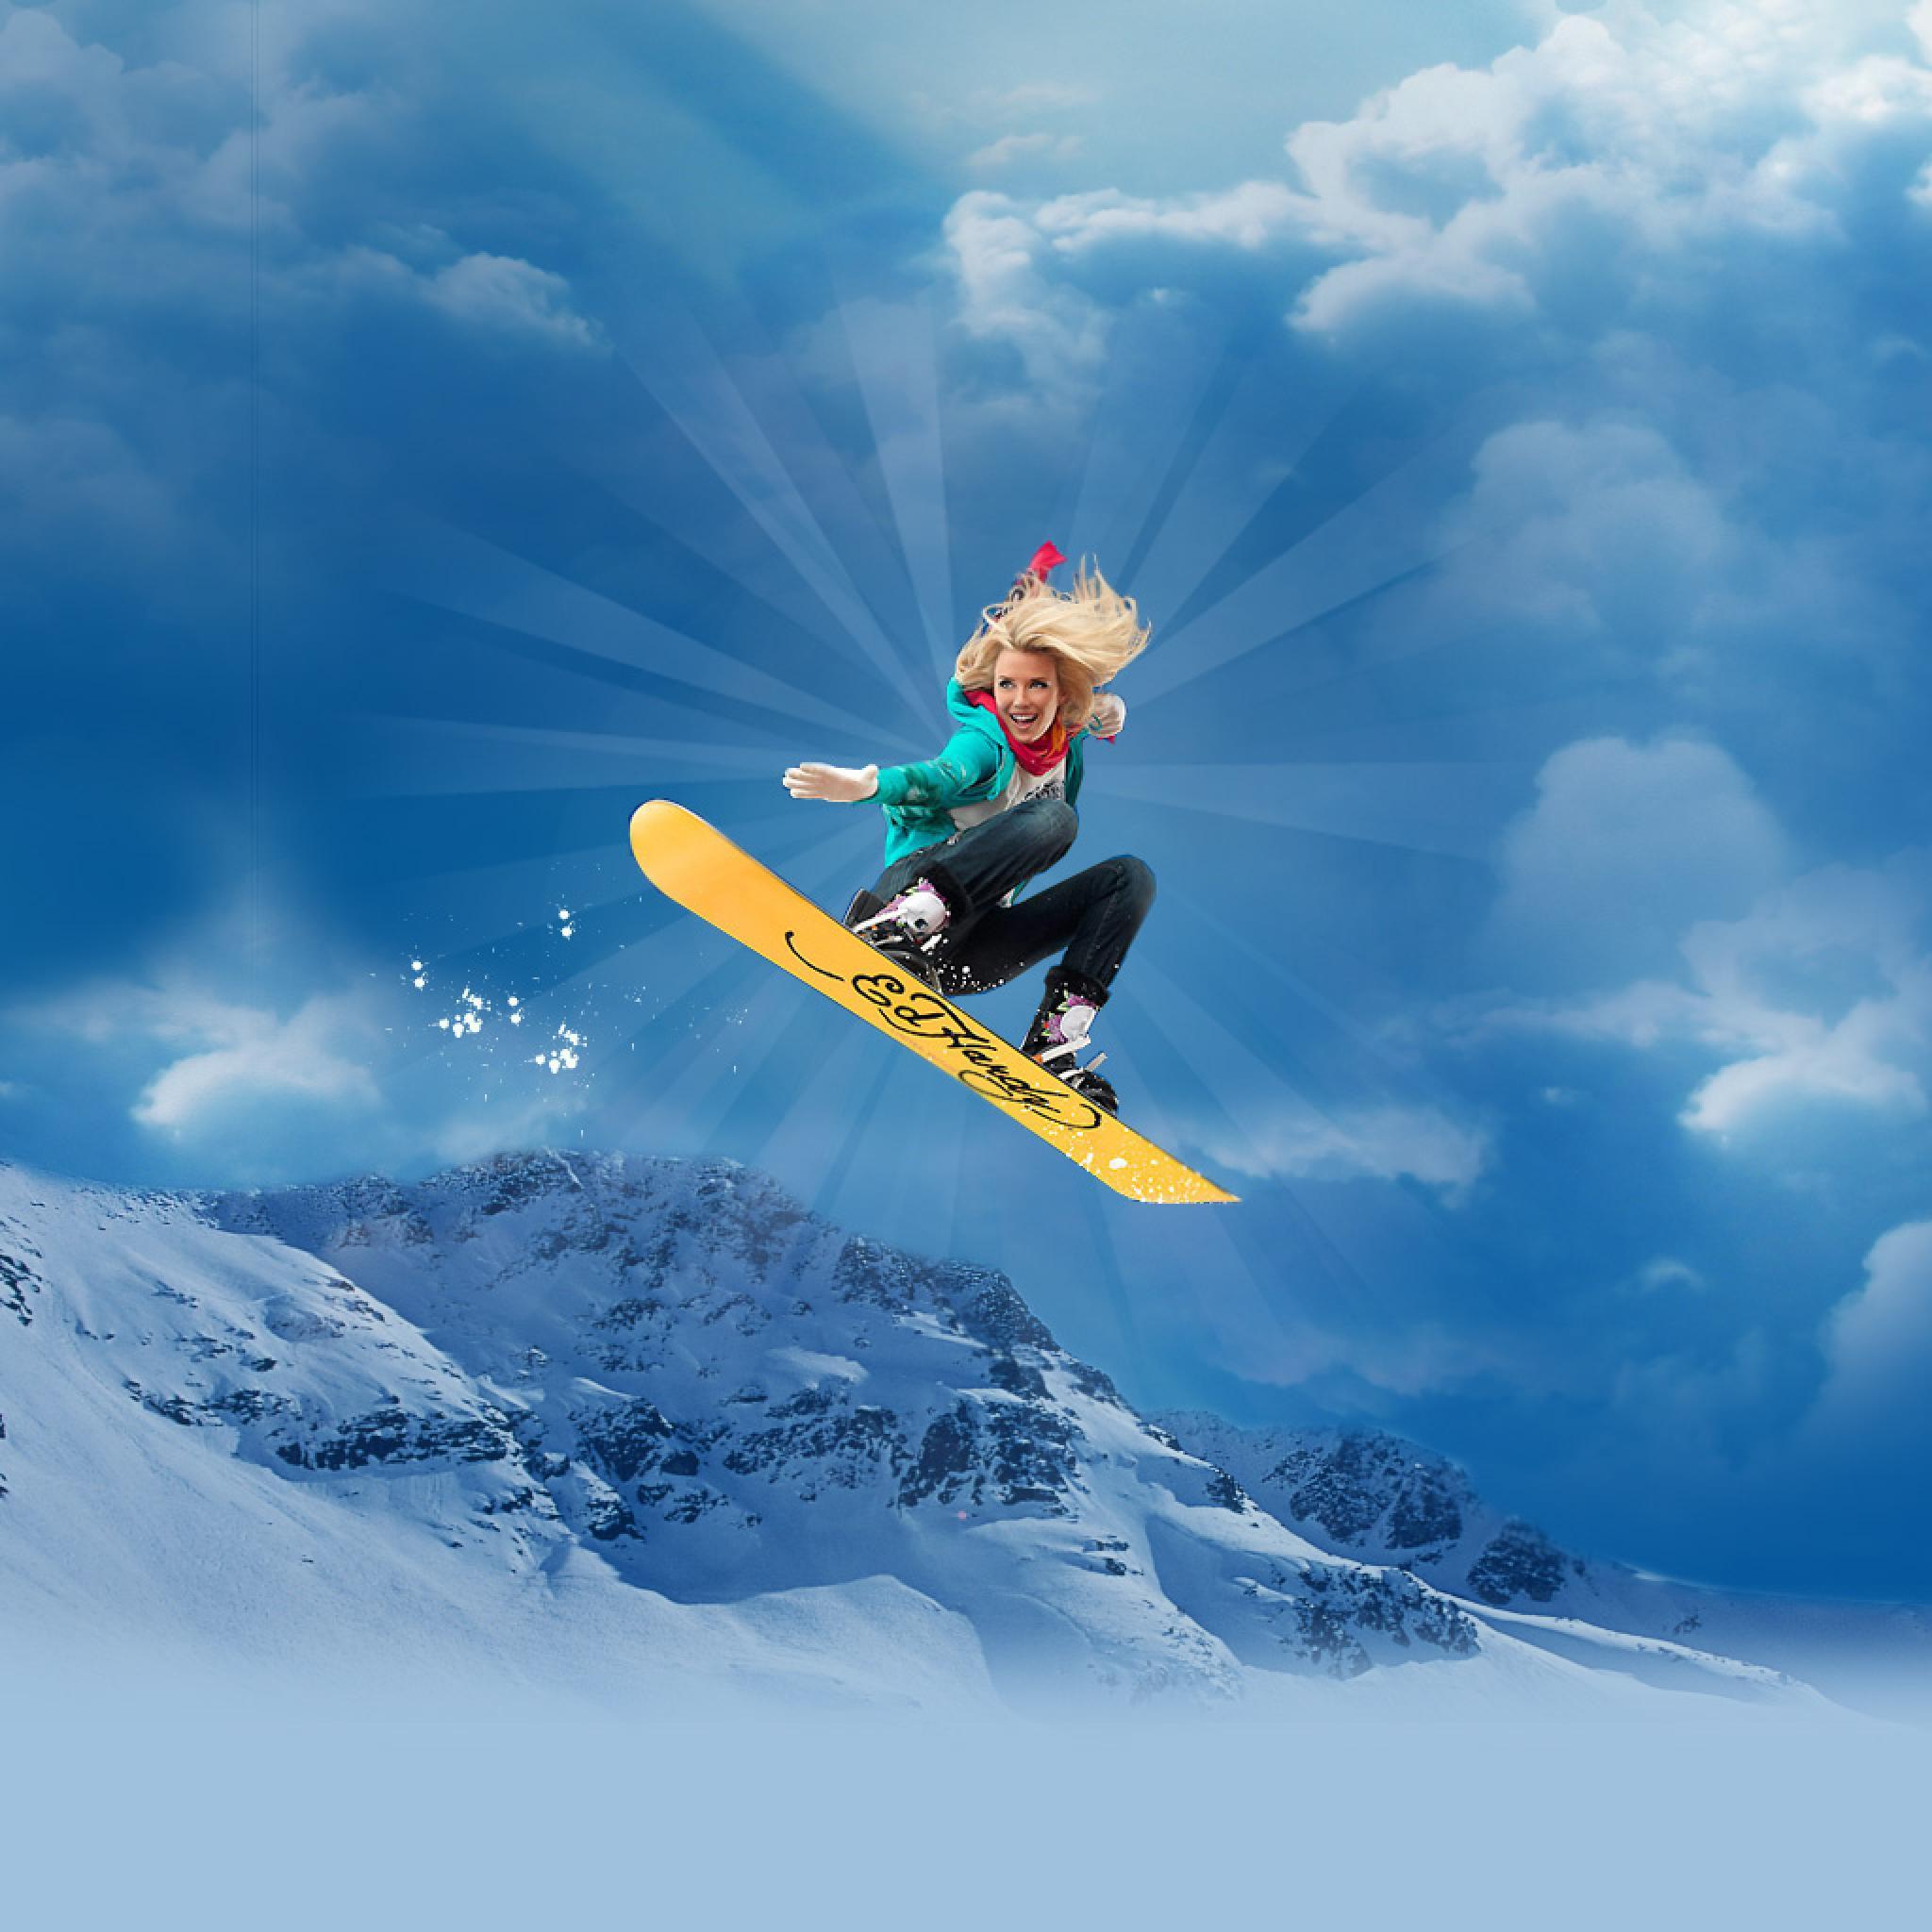 Snowboard Girl Wallpaper Vector Hottest Snowboard Girl Style Ipad Iphone Hd